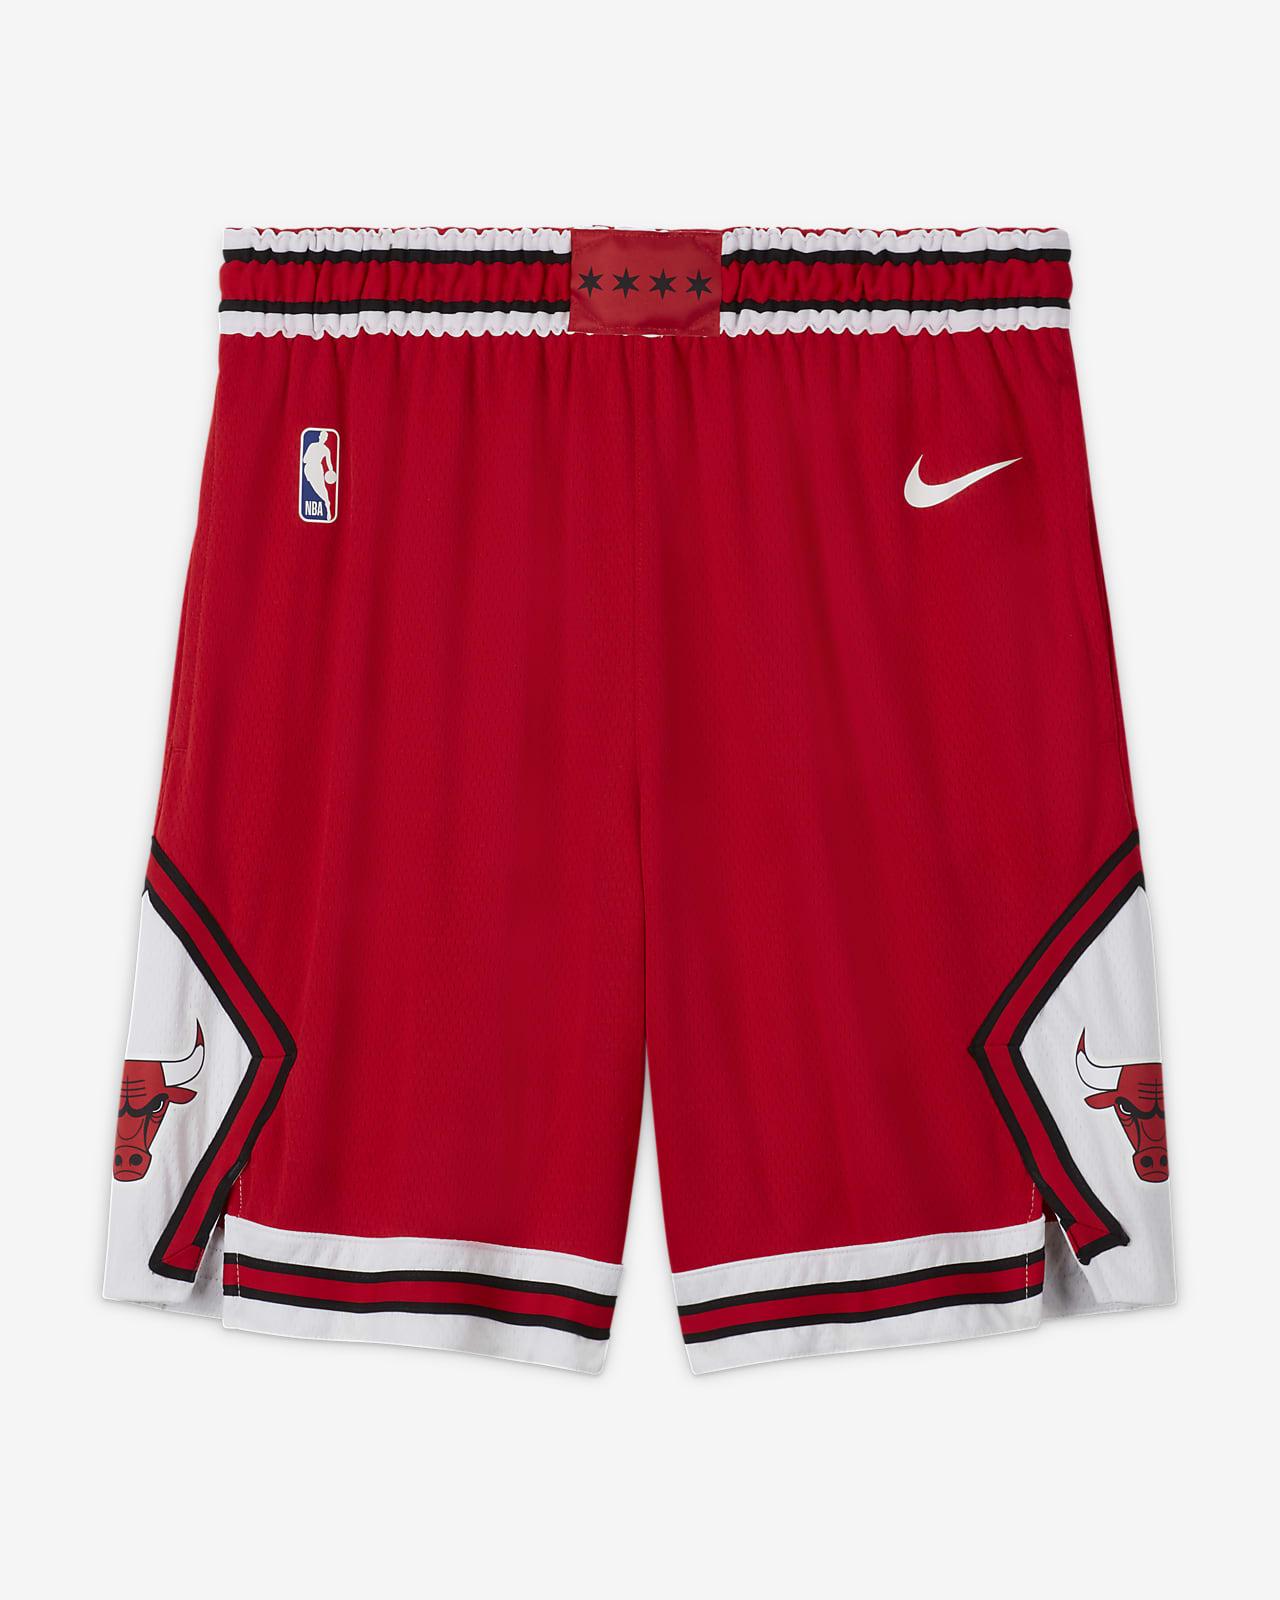 Chicago Bulls Icon Edition Men's Nike NBA Swingman Shorts